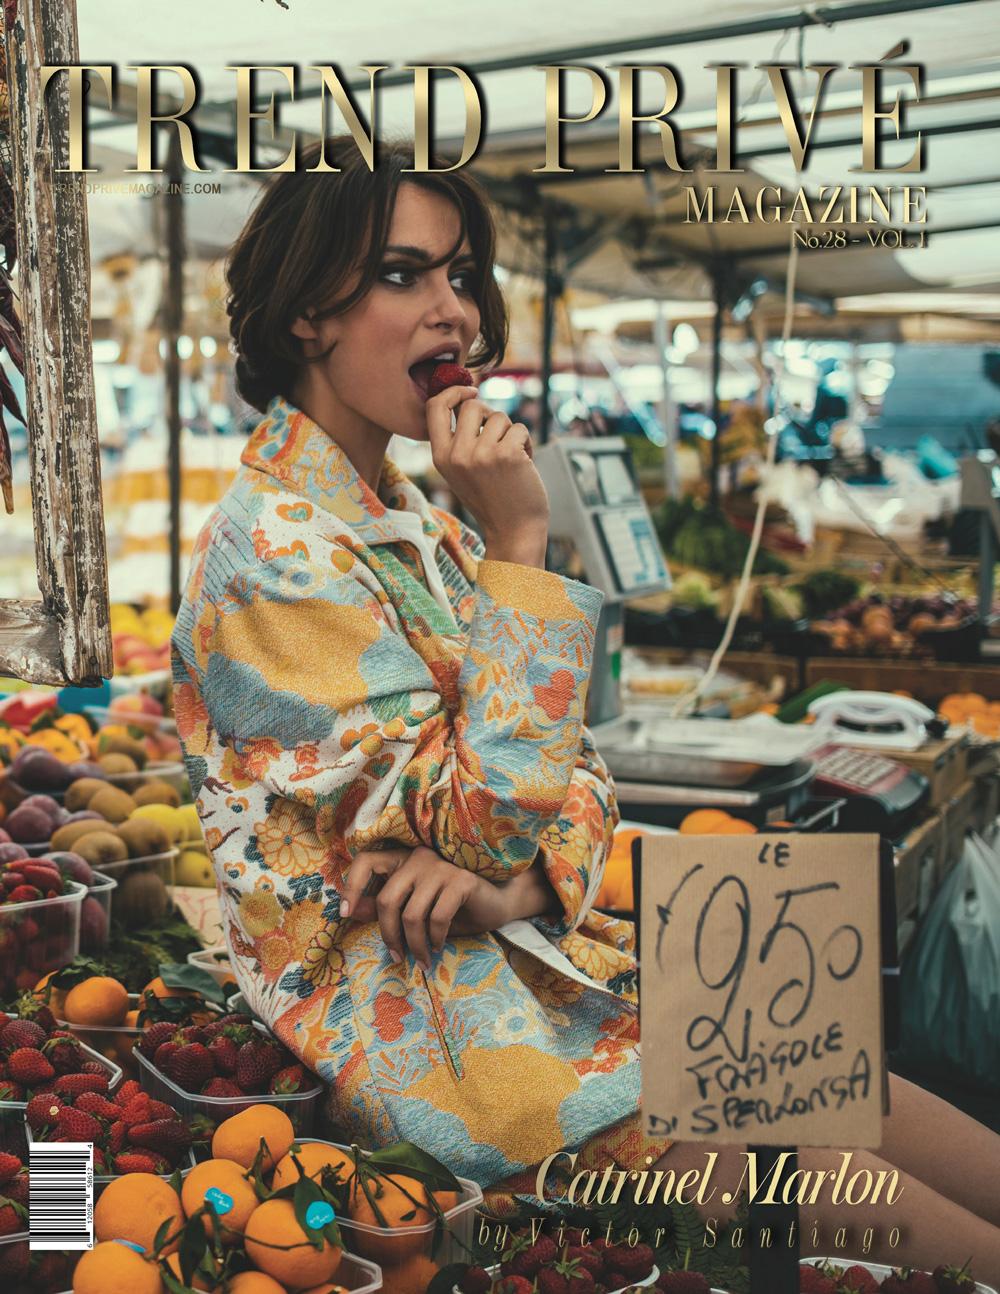 Issue-28-VOL-1.jpg